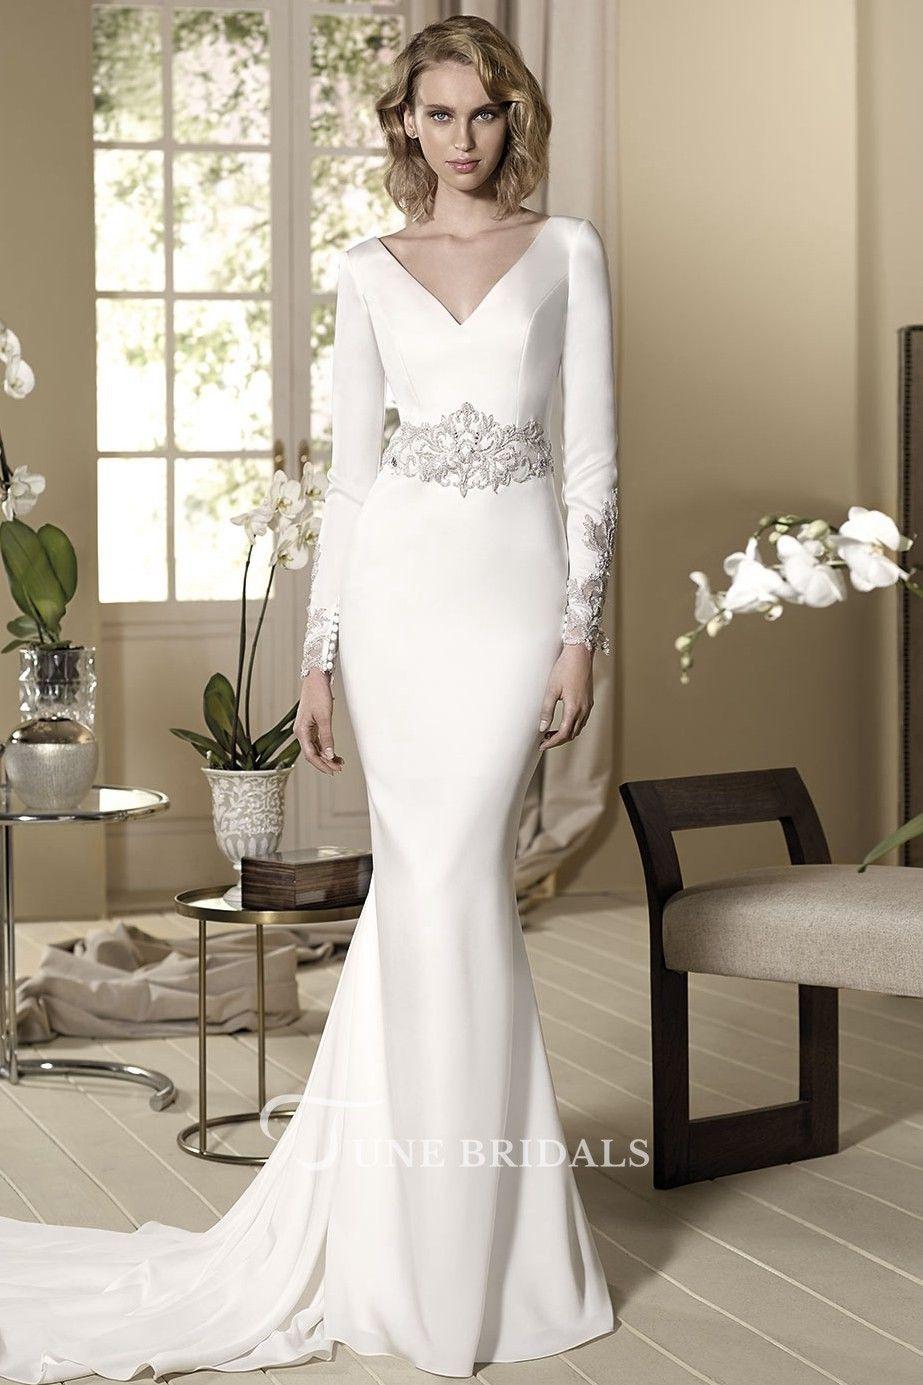 bb60372029ca Sheath Beaded Long-Sleeve Floor-Length V-Neck Jersey Wedding Dress - June  Bridals